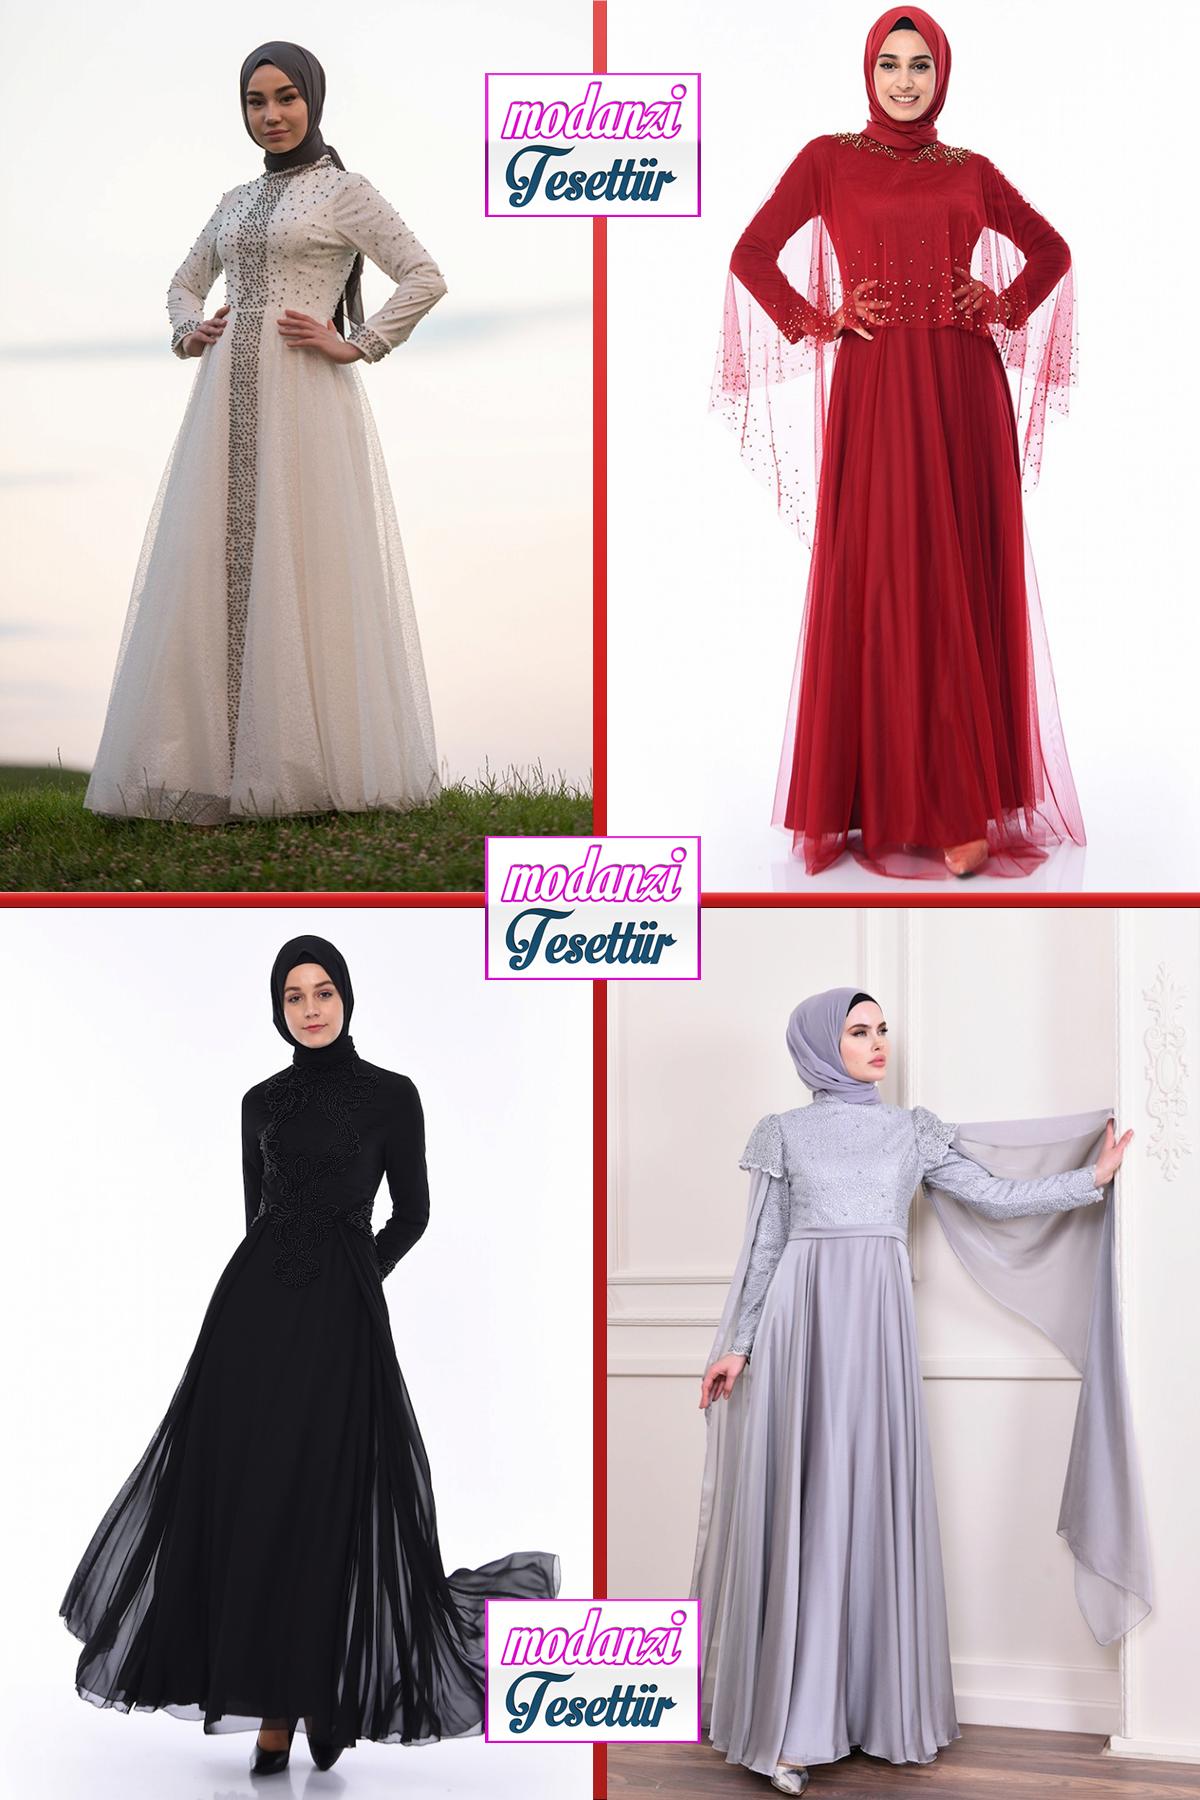 2020 Sefamerve Tesettur Abiye Elbise Modelleri 12 30 Abendkleid Evening Dress 2020 Elbise Resmi Elbise Moda Stilleri